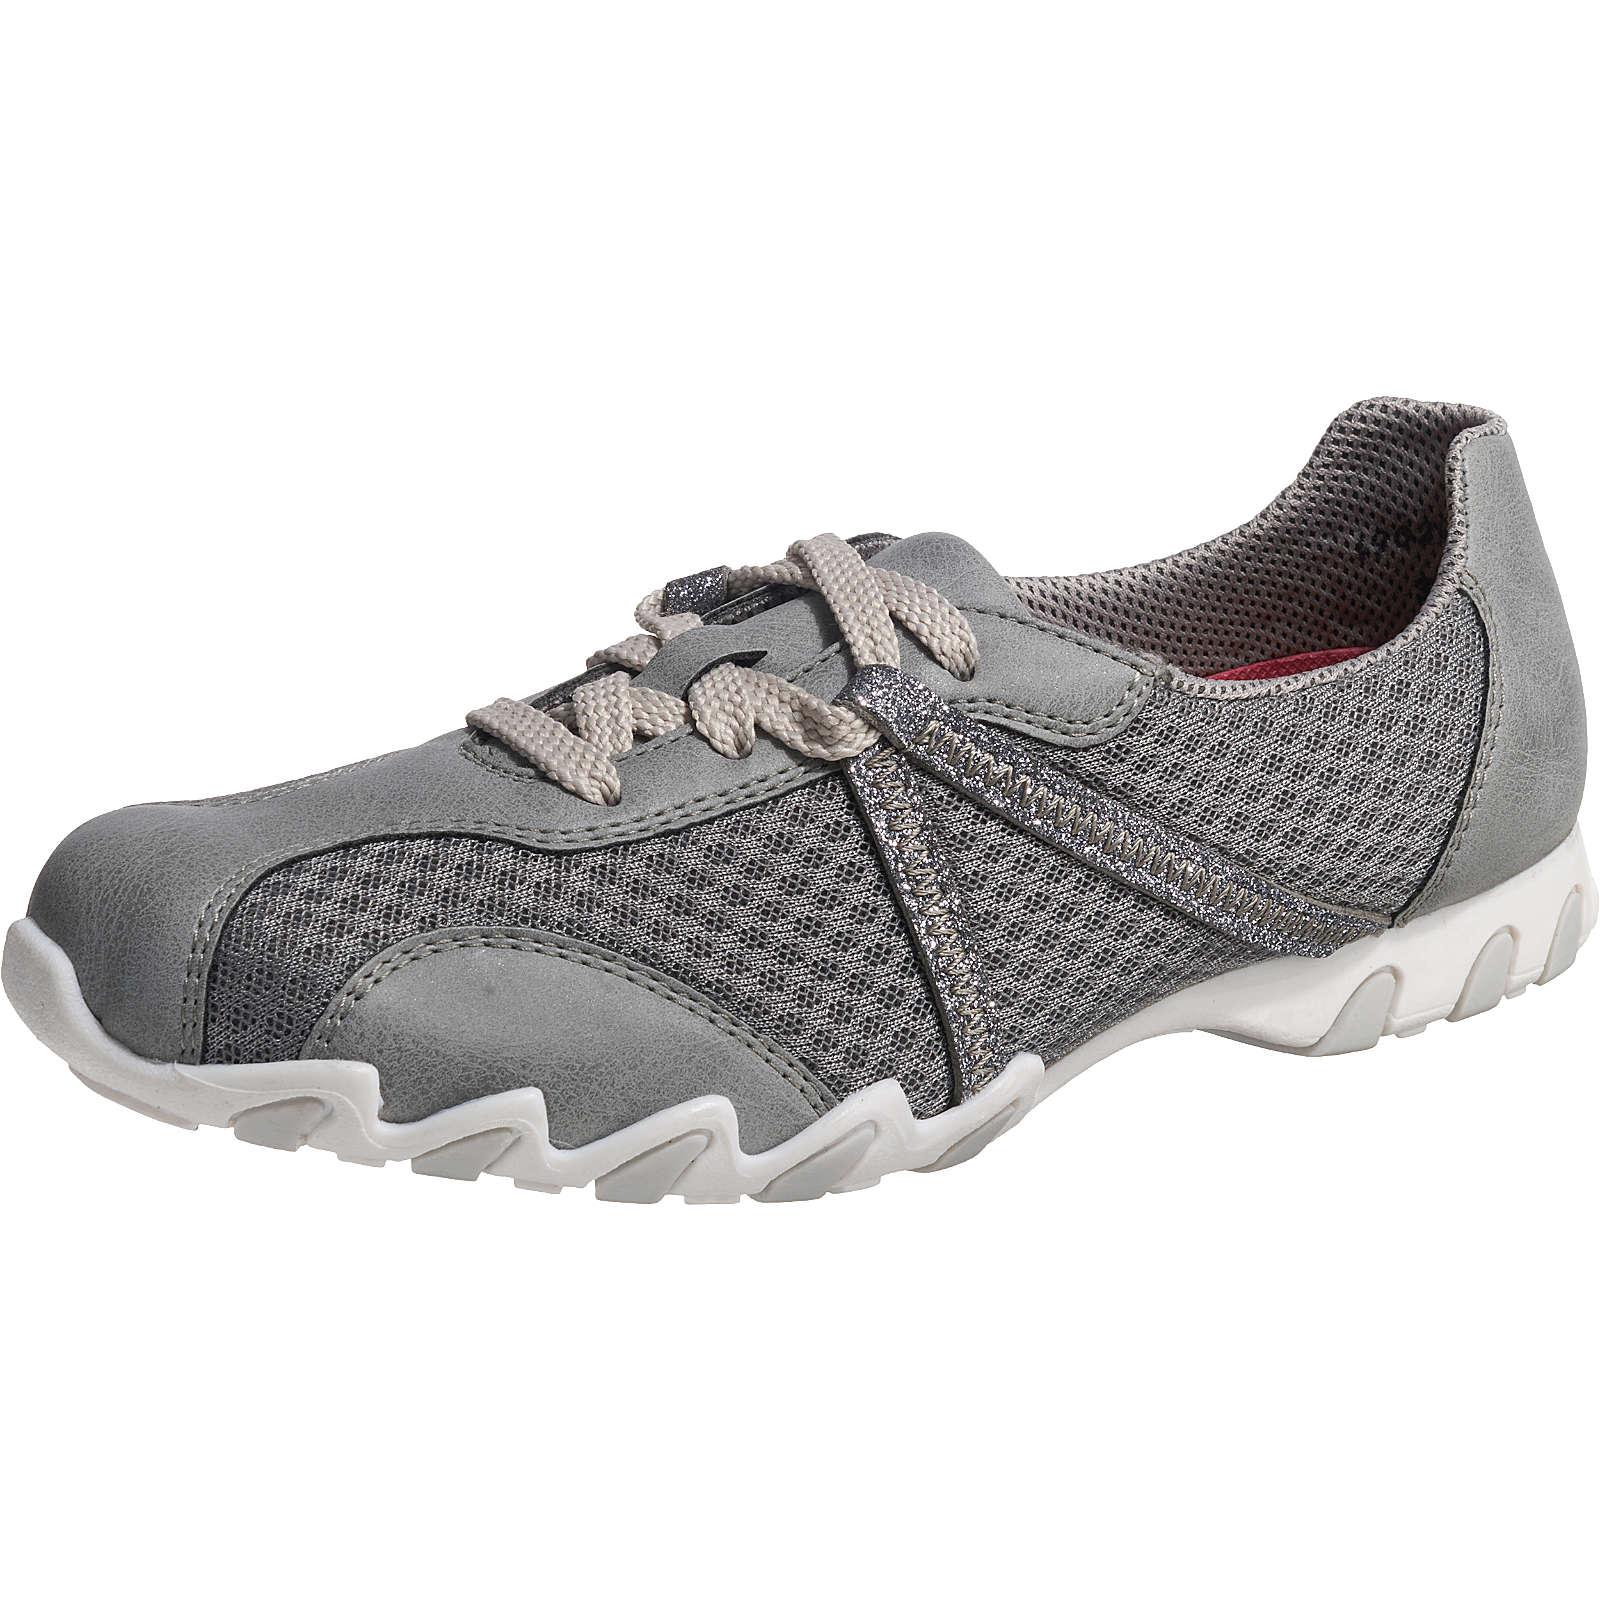 rieker Brindis/Aerea/Galassia Sneakers Low grau Damen Gr. 36